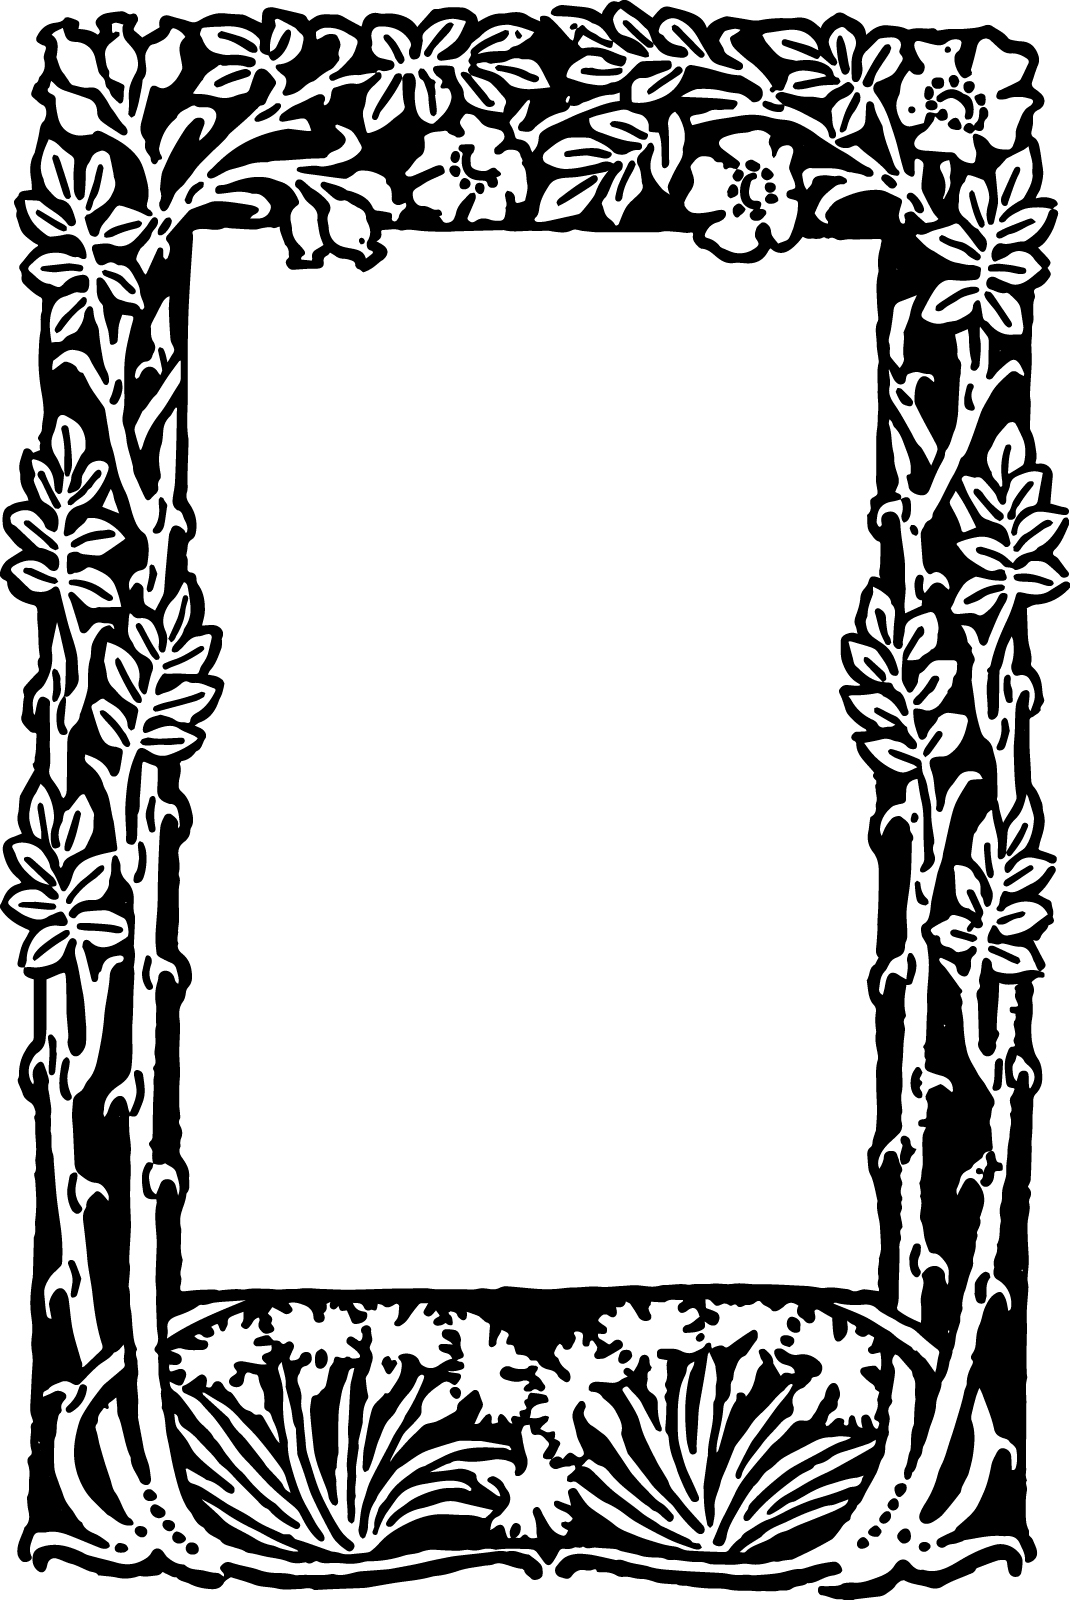 Free Printable Borders Frames